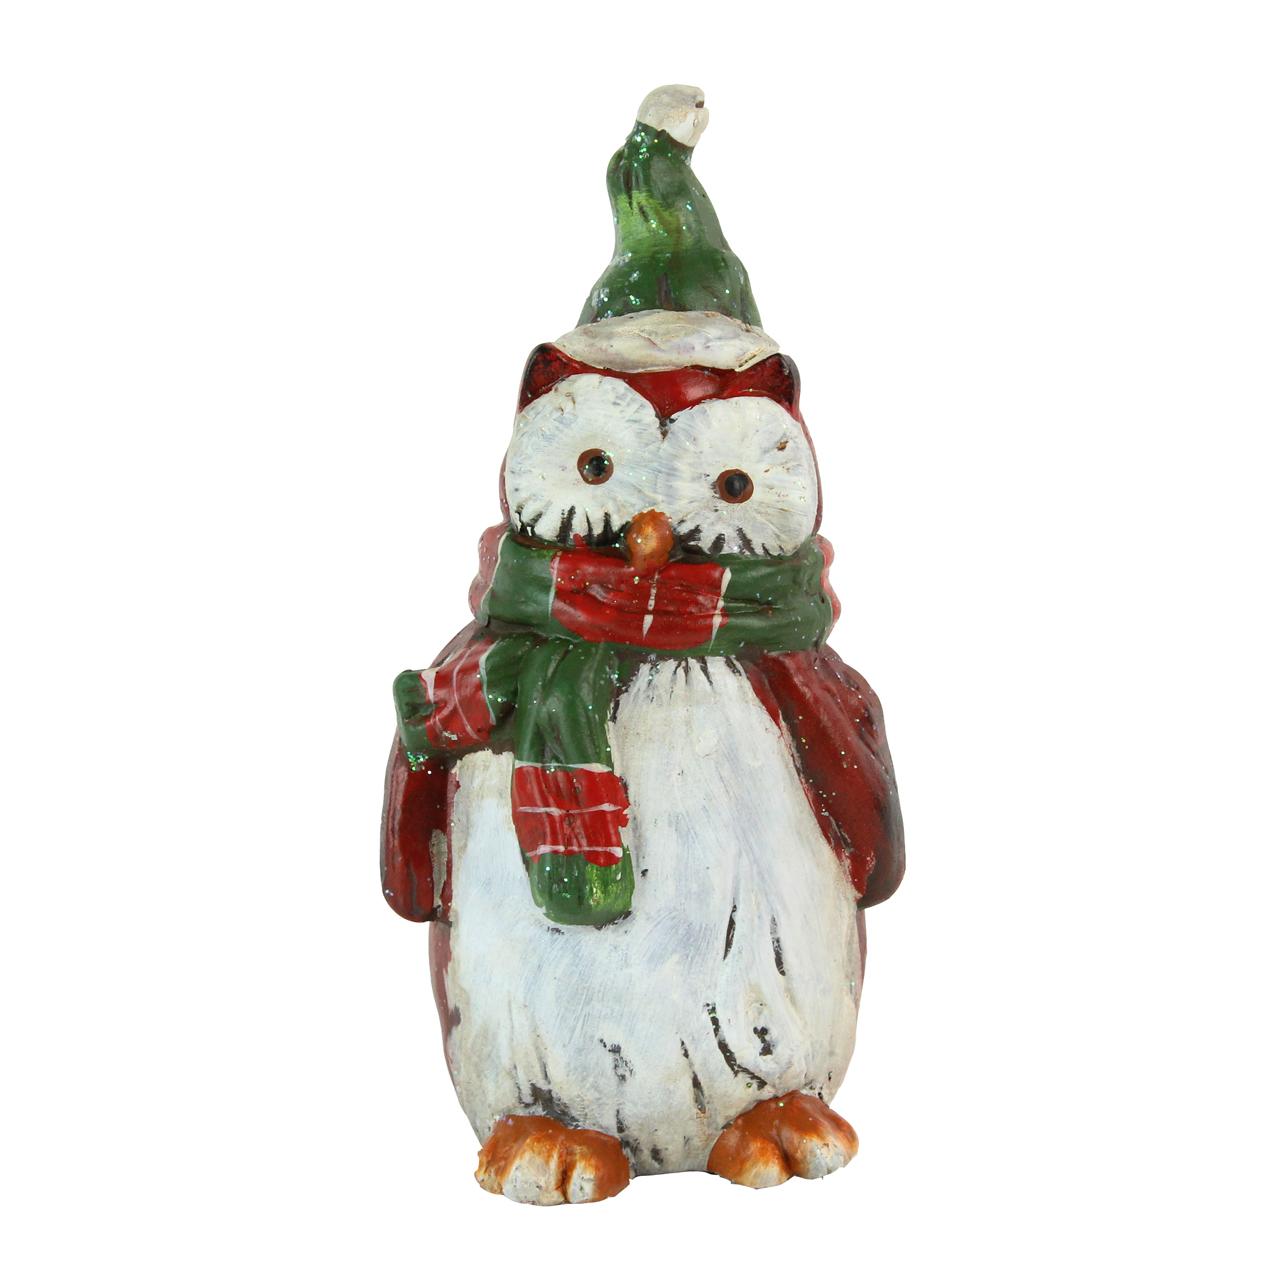 Decoratiune Bufnita Cu Caciula Verde Din Ceramica